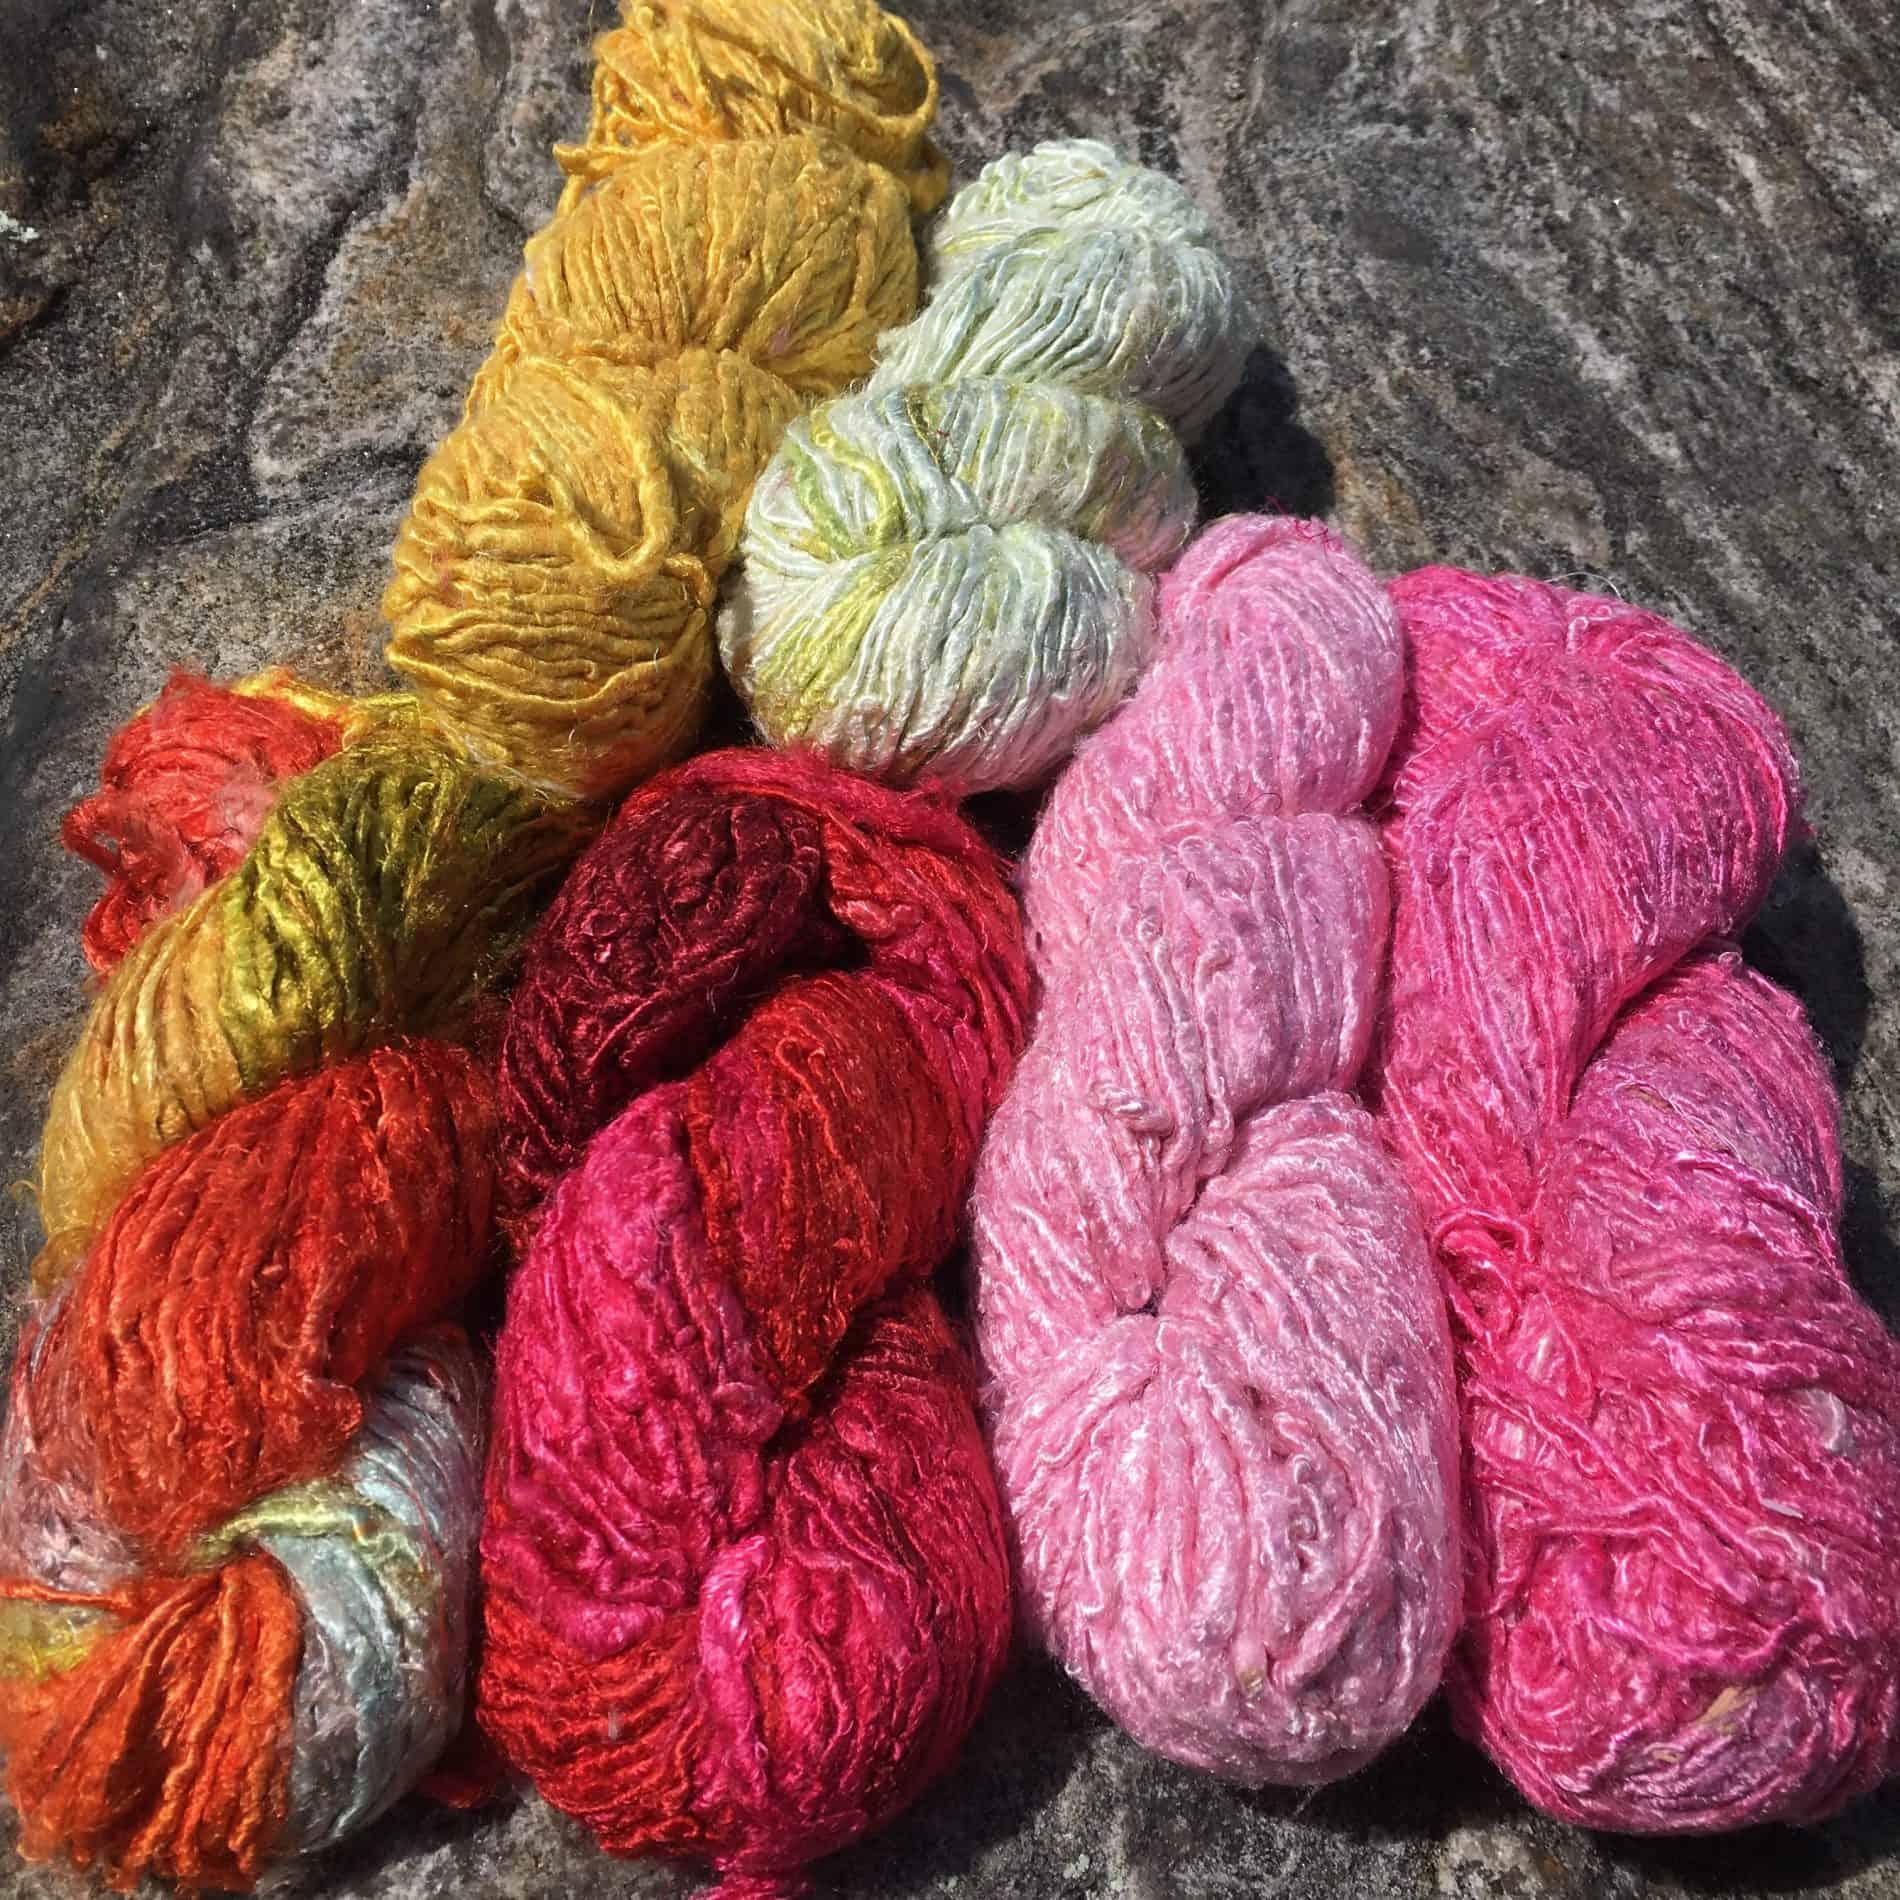 Banana fibre yarn